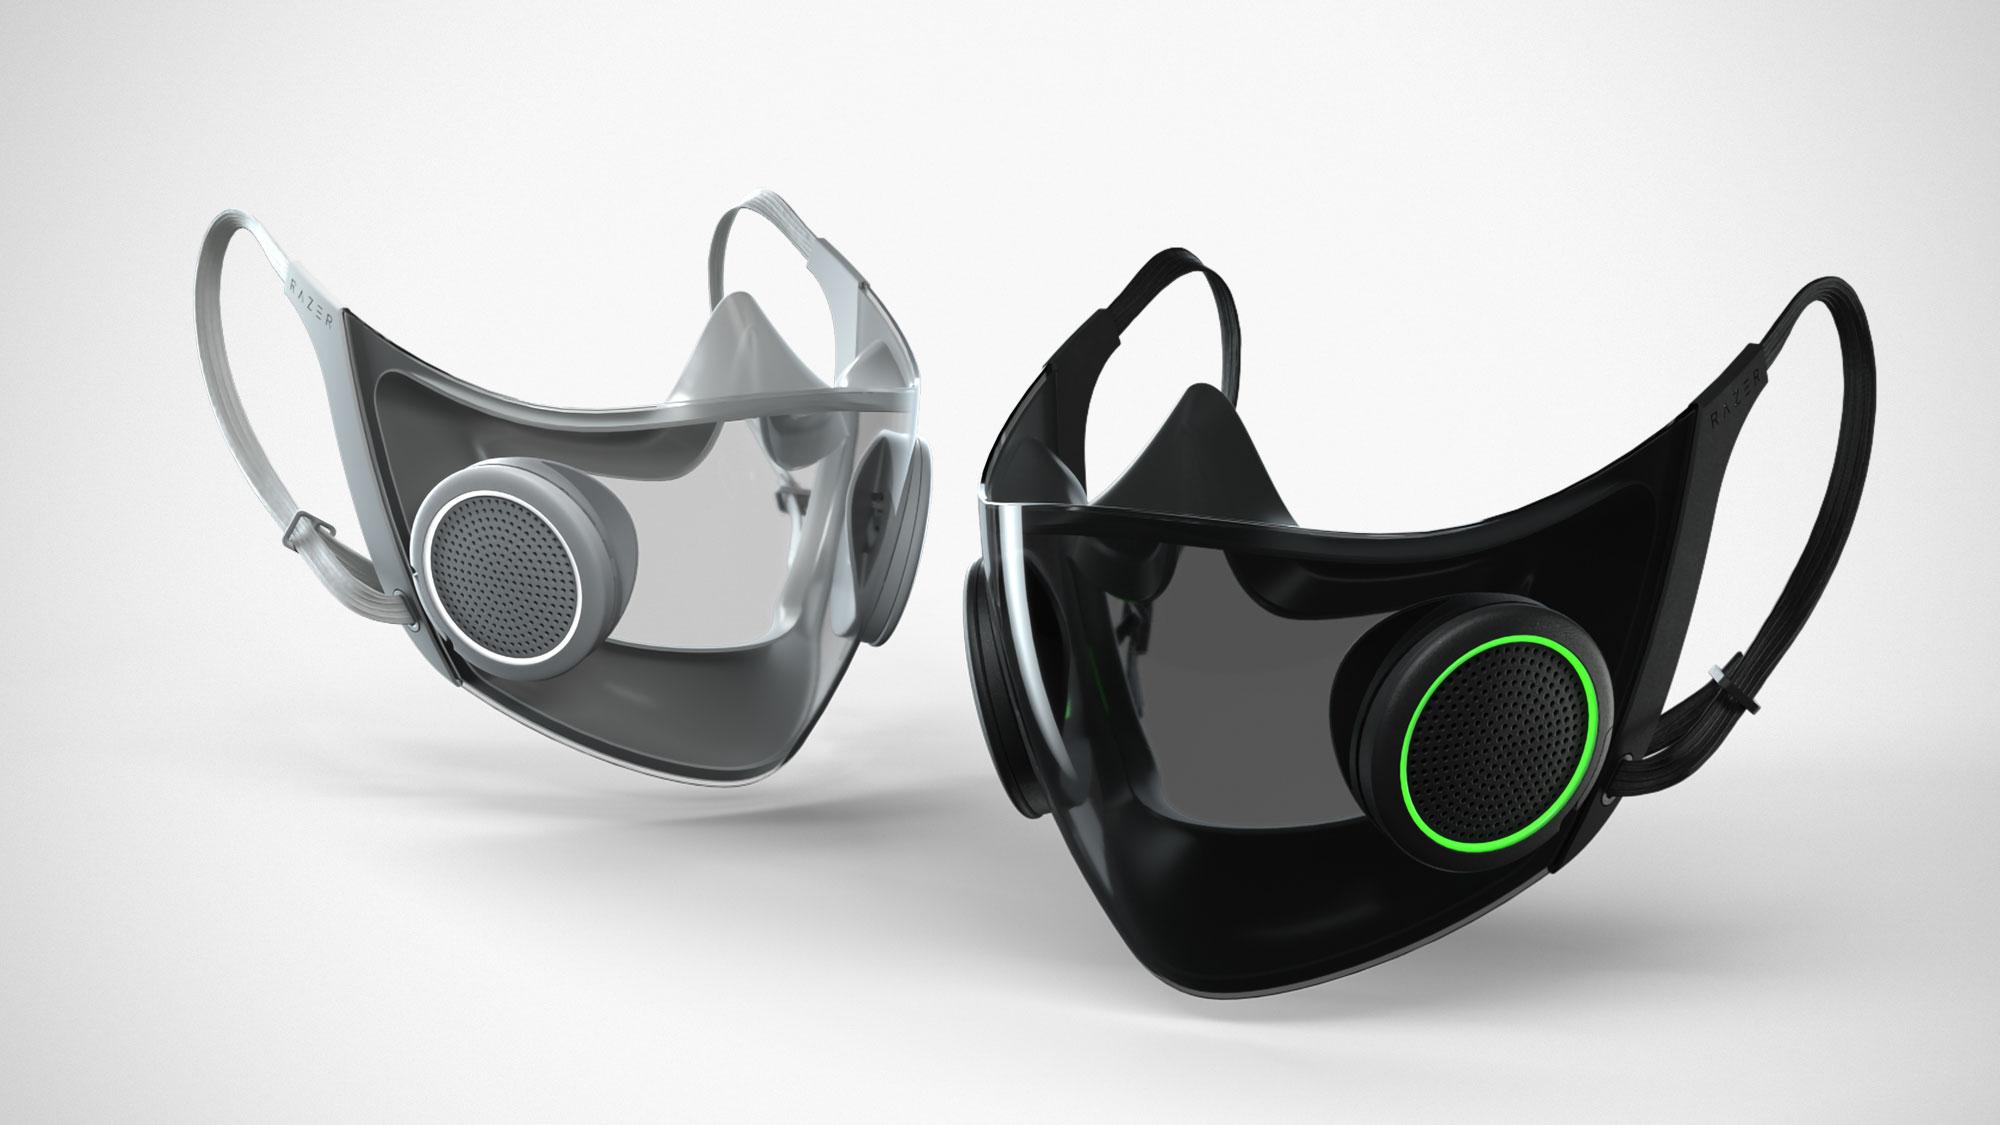 Razer Project Hazel Smart Mask CES 2021